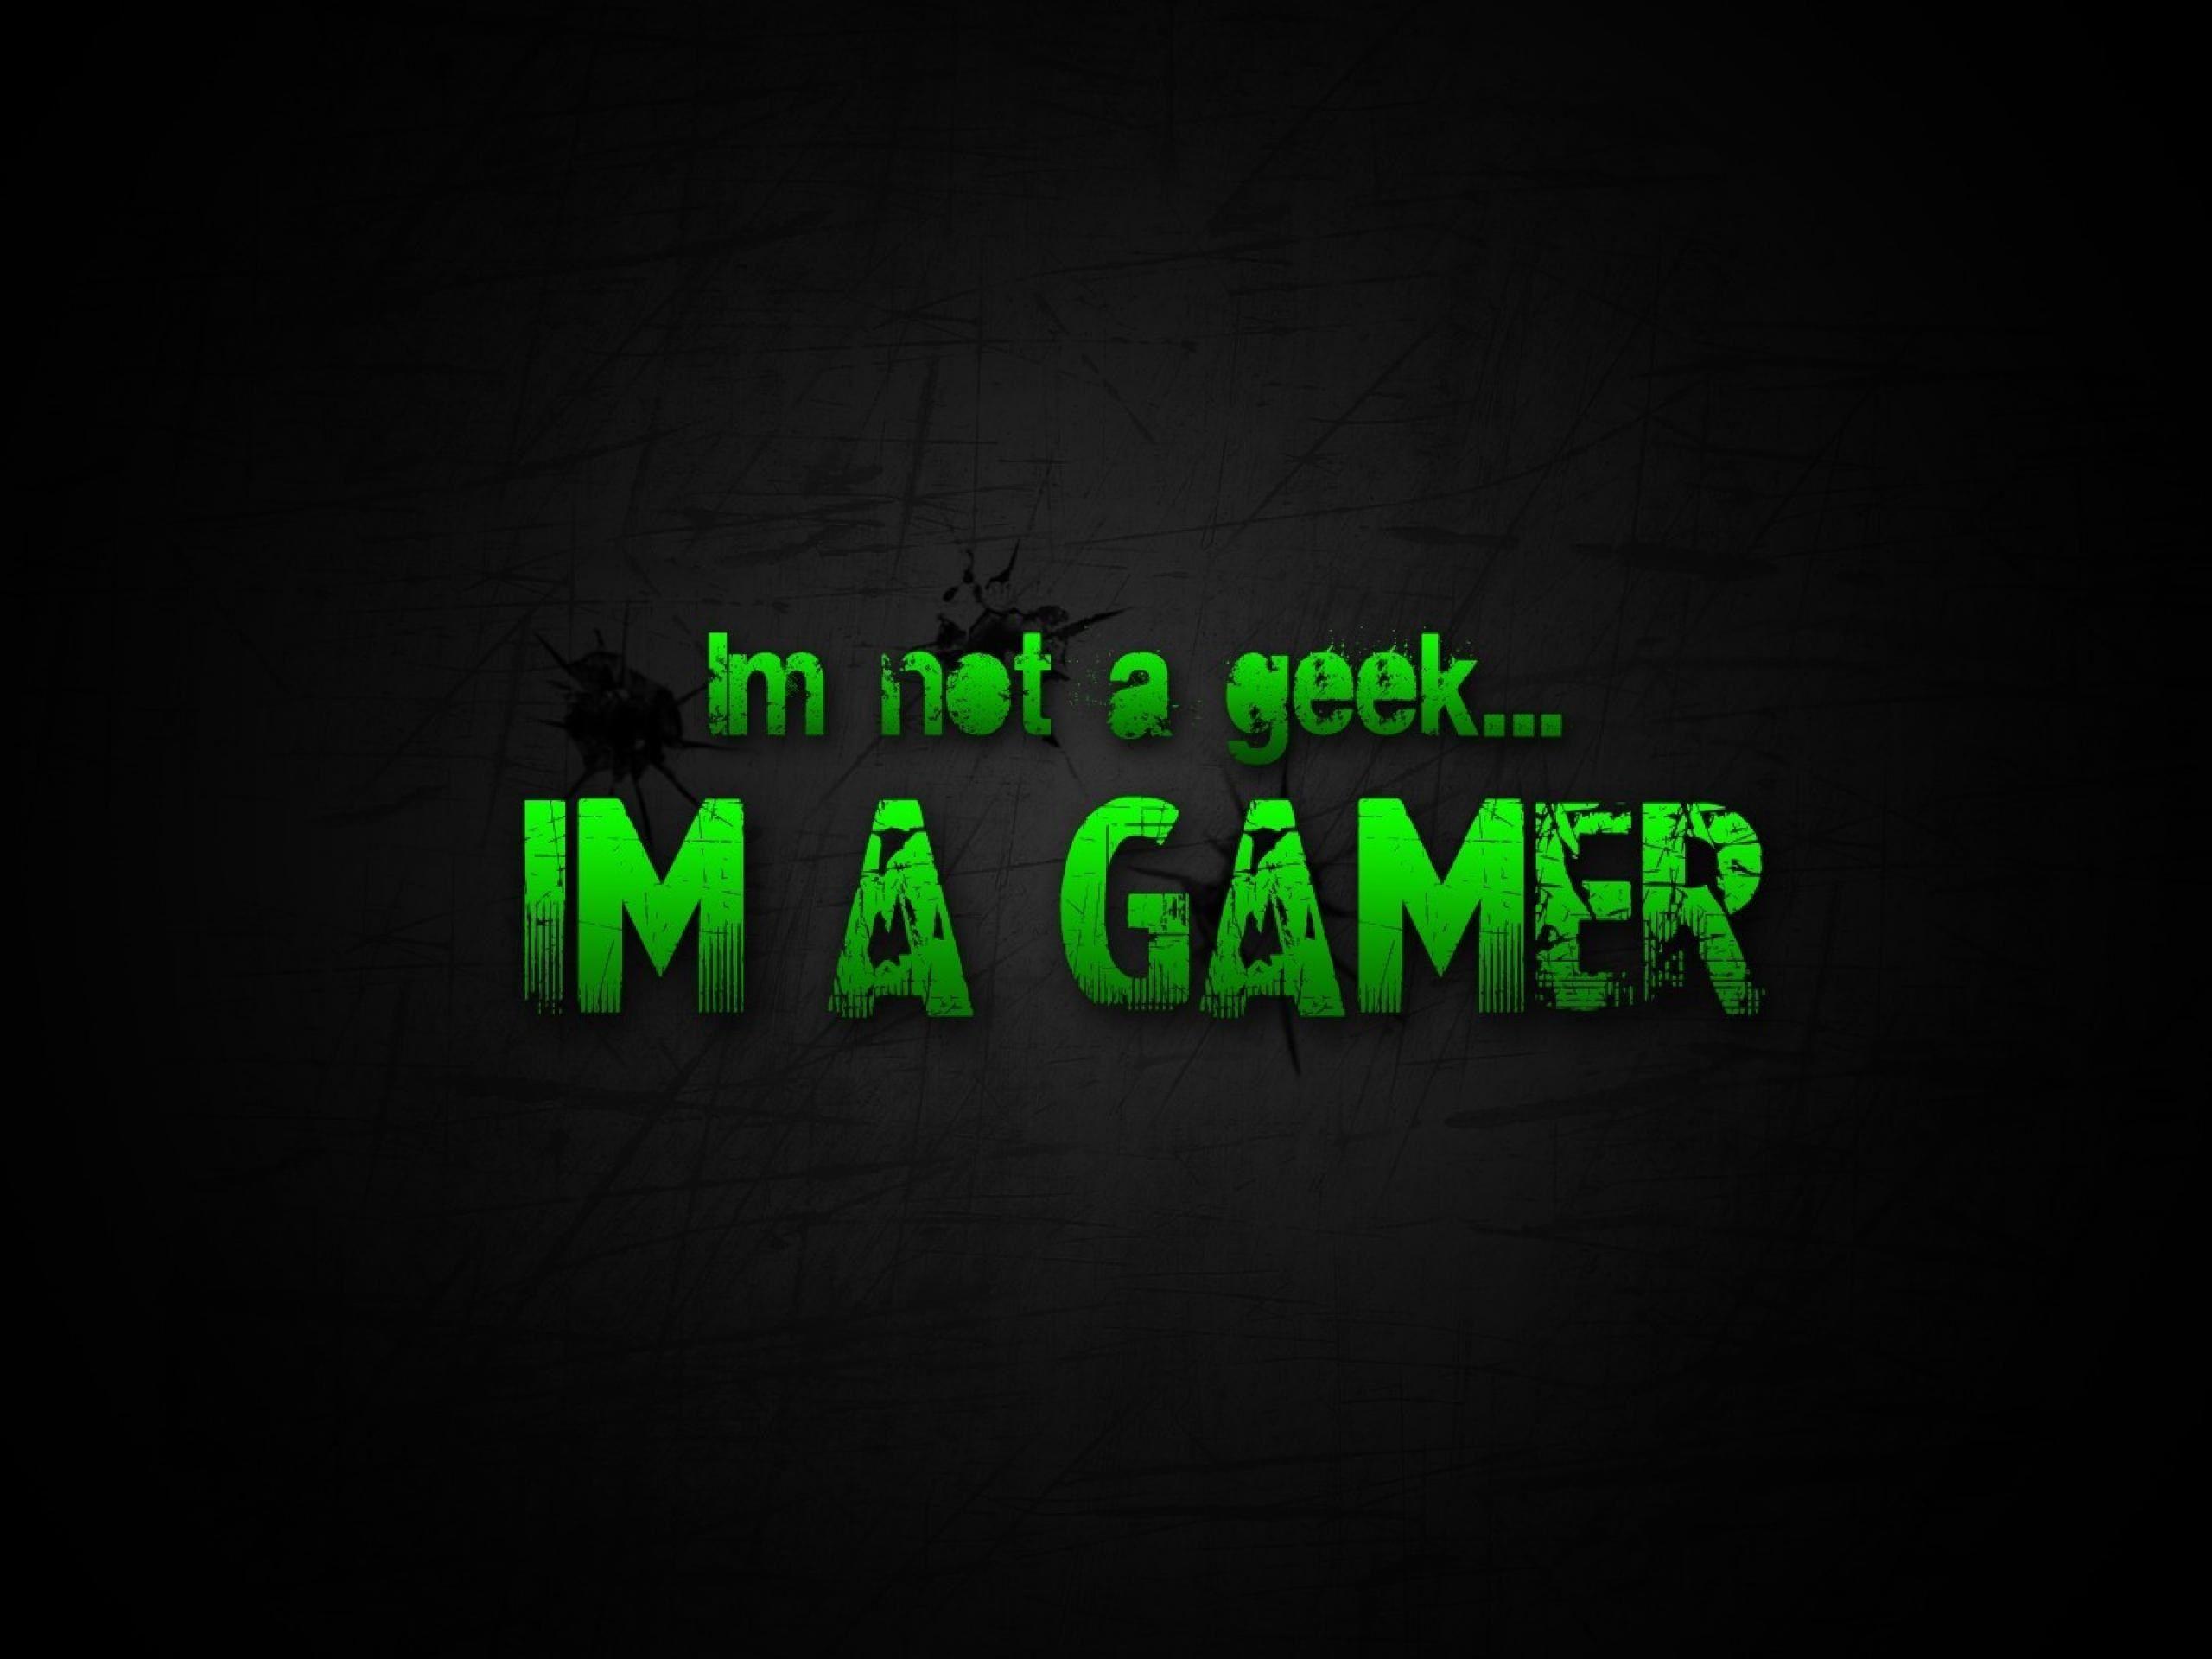 Gamer Wallpapers Hd Gaming Wallpapers Gaming Wallpapers Hd Gamer Quotes